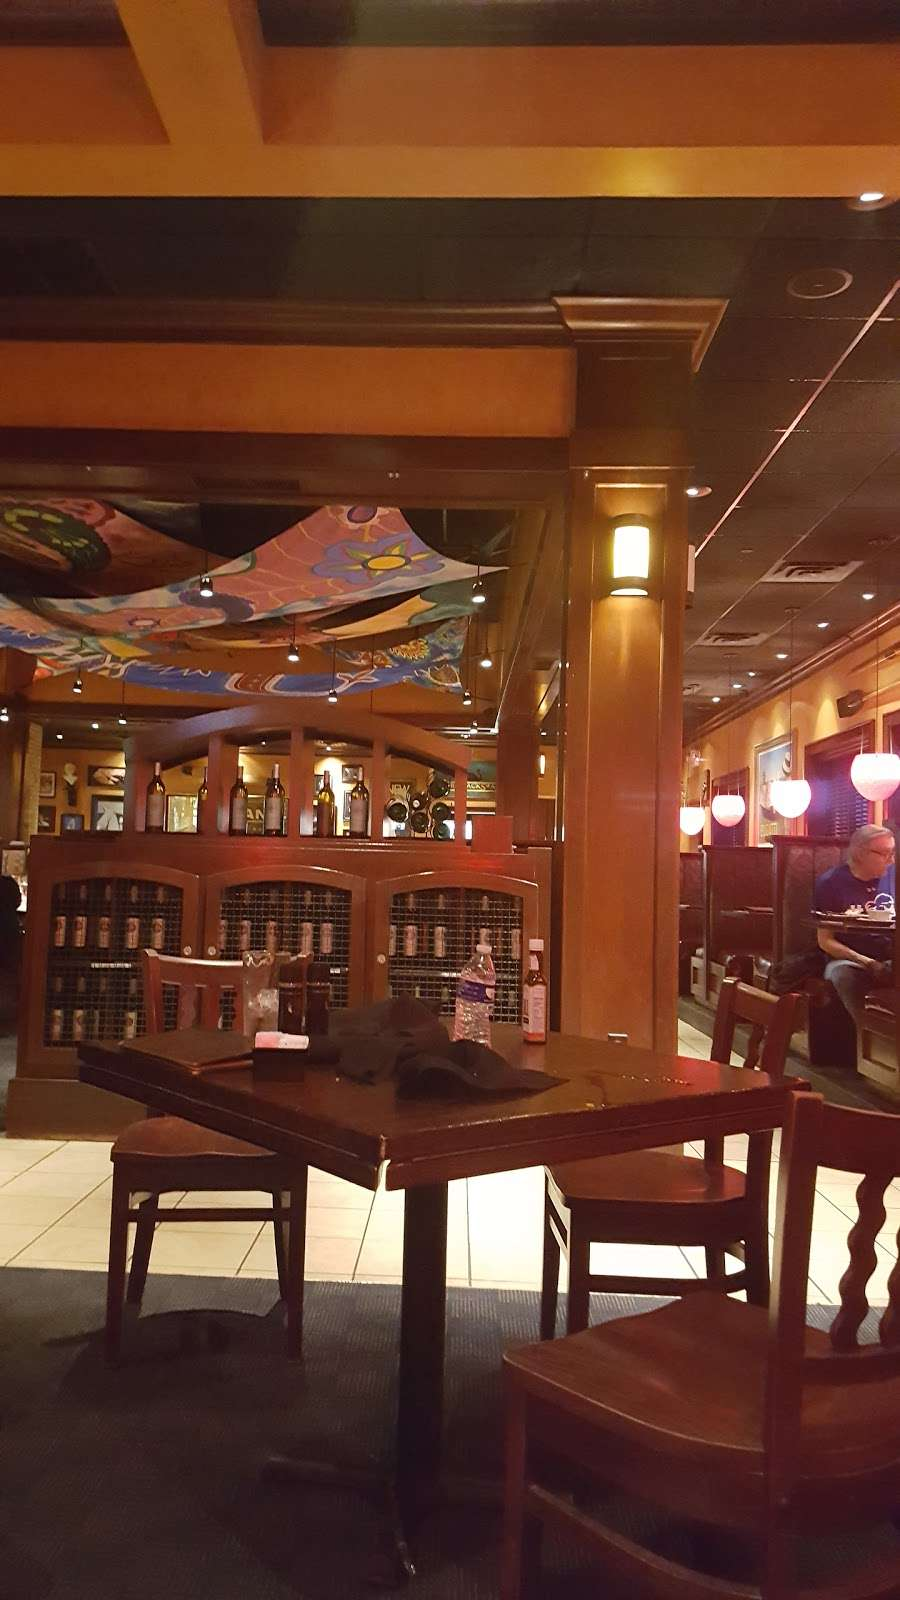 Houlihans - restaurant  | Photo 9 of 10 | Address: 151 Lefante Way, Bayonne, NJ 07002, USA | Phone: (201) 858-0400